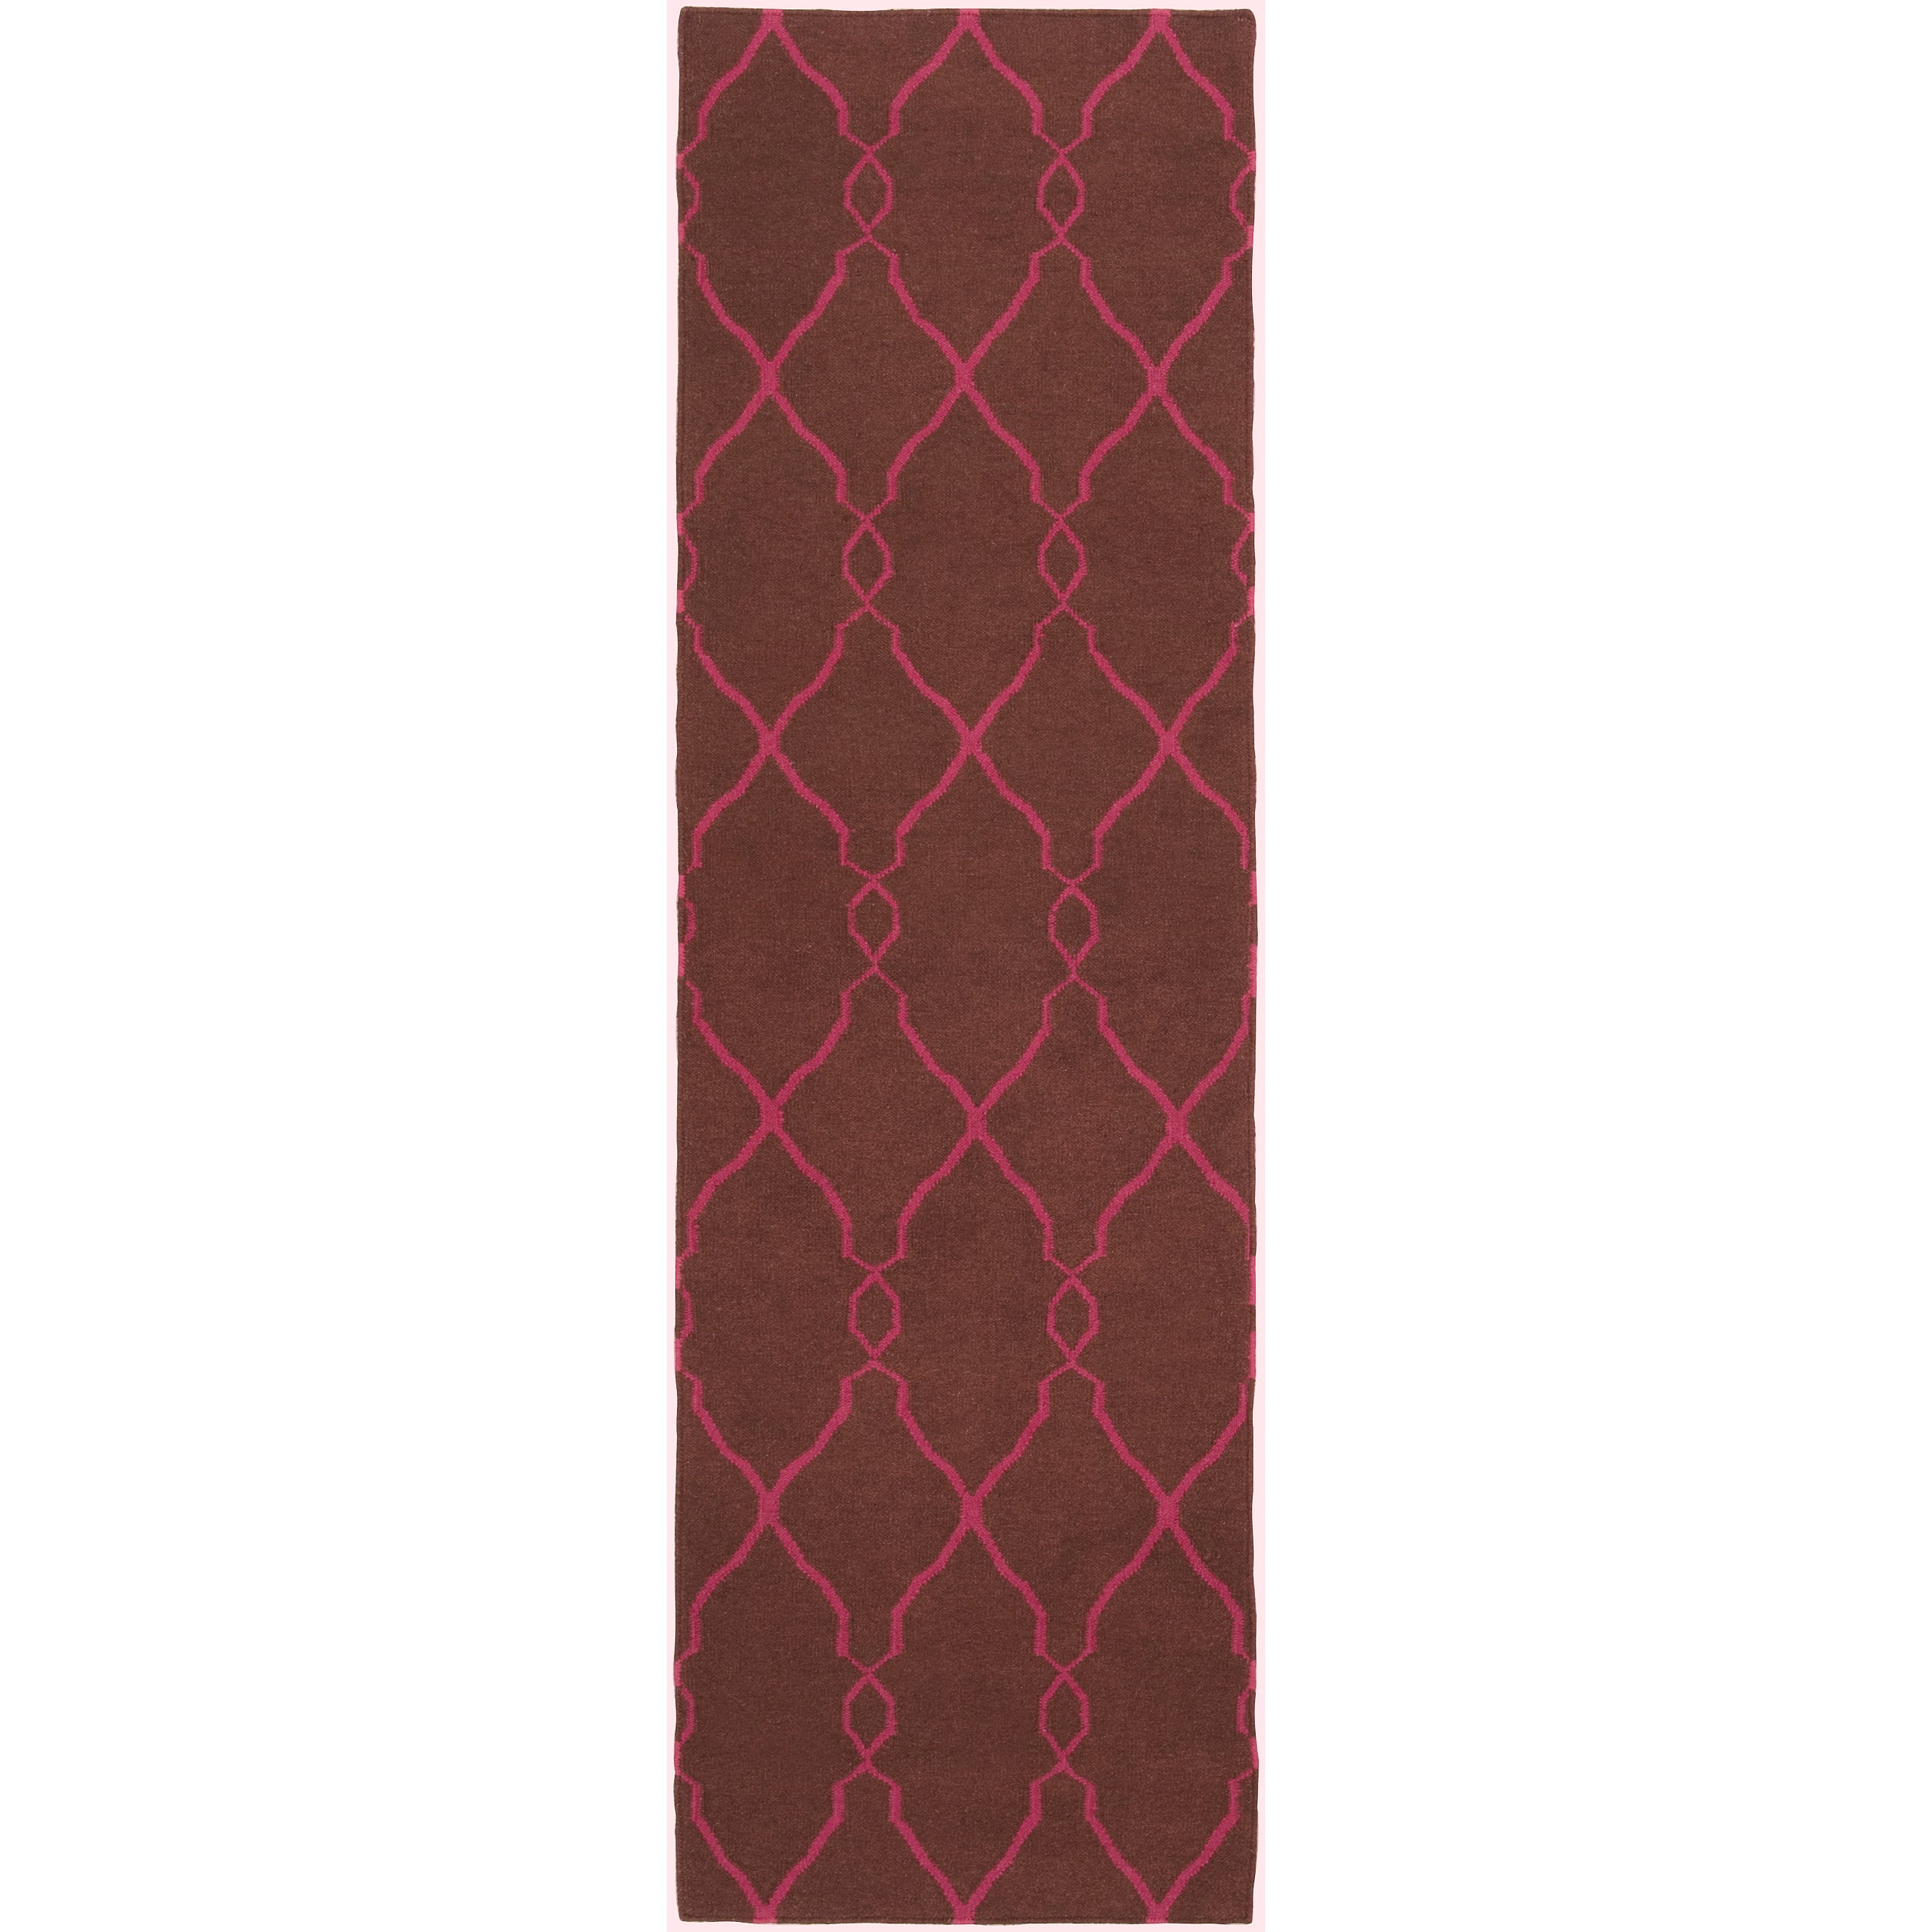 Jill Rosenwald Hand-woven Pink Catacomb Wool Rug (2'6 x 8')